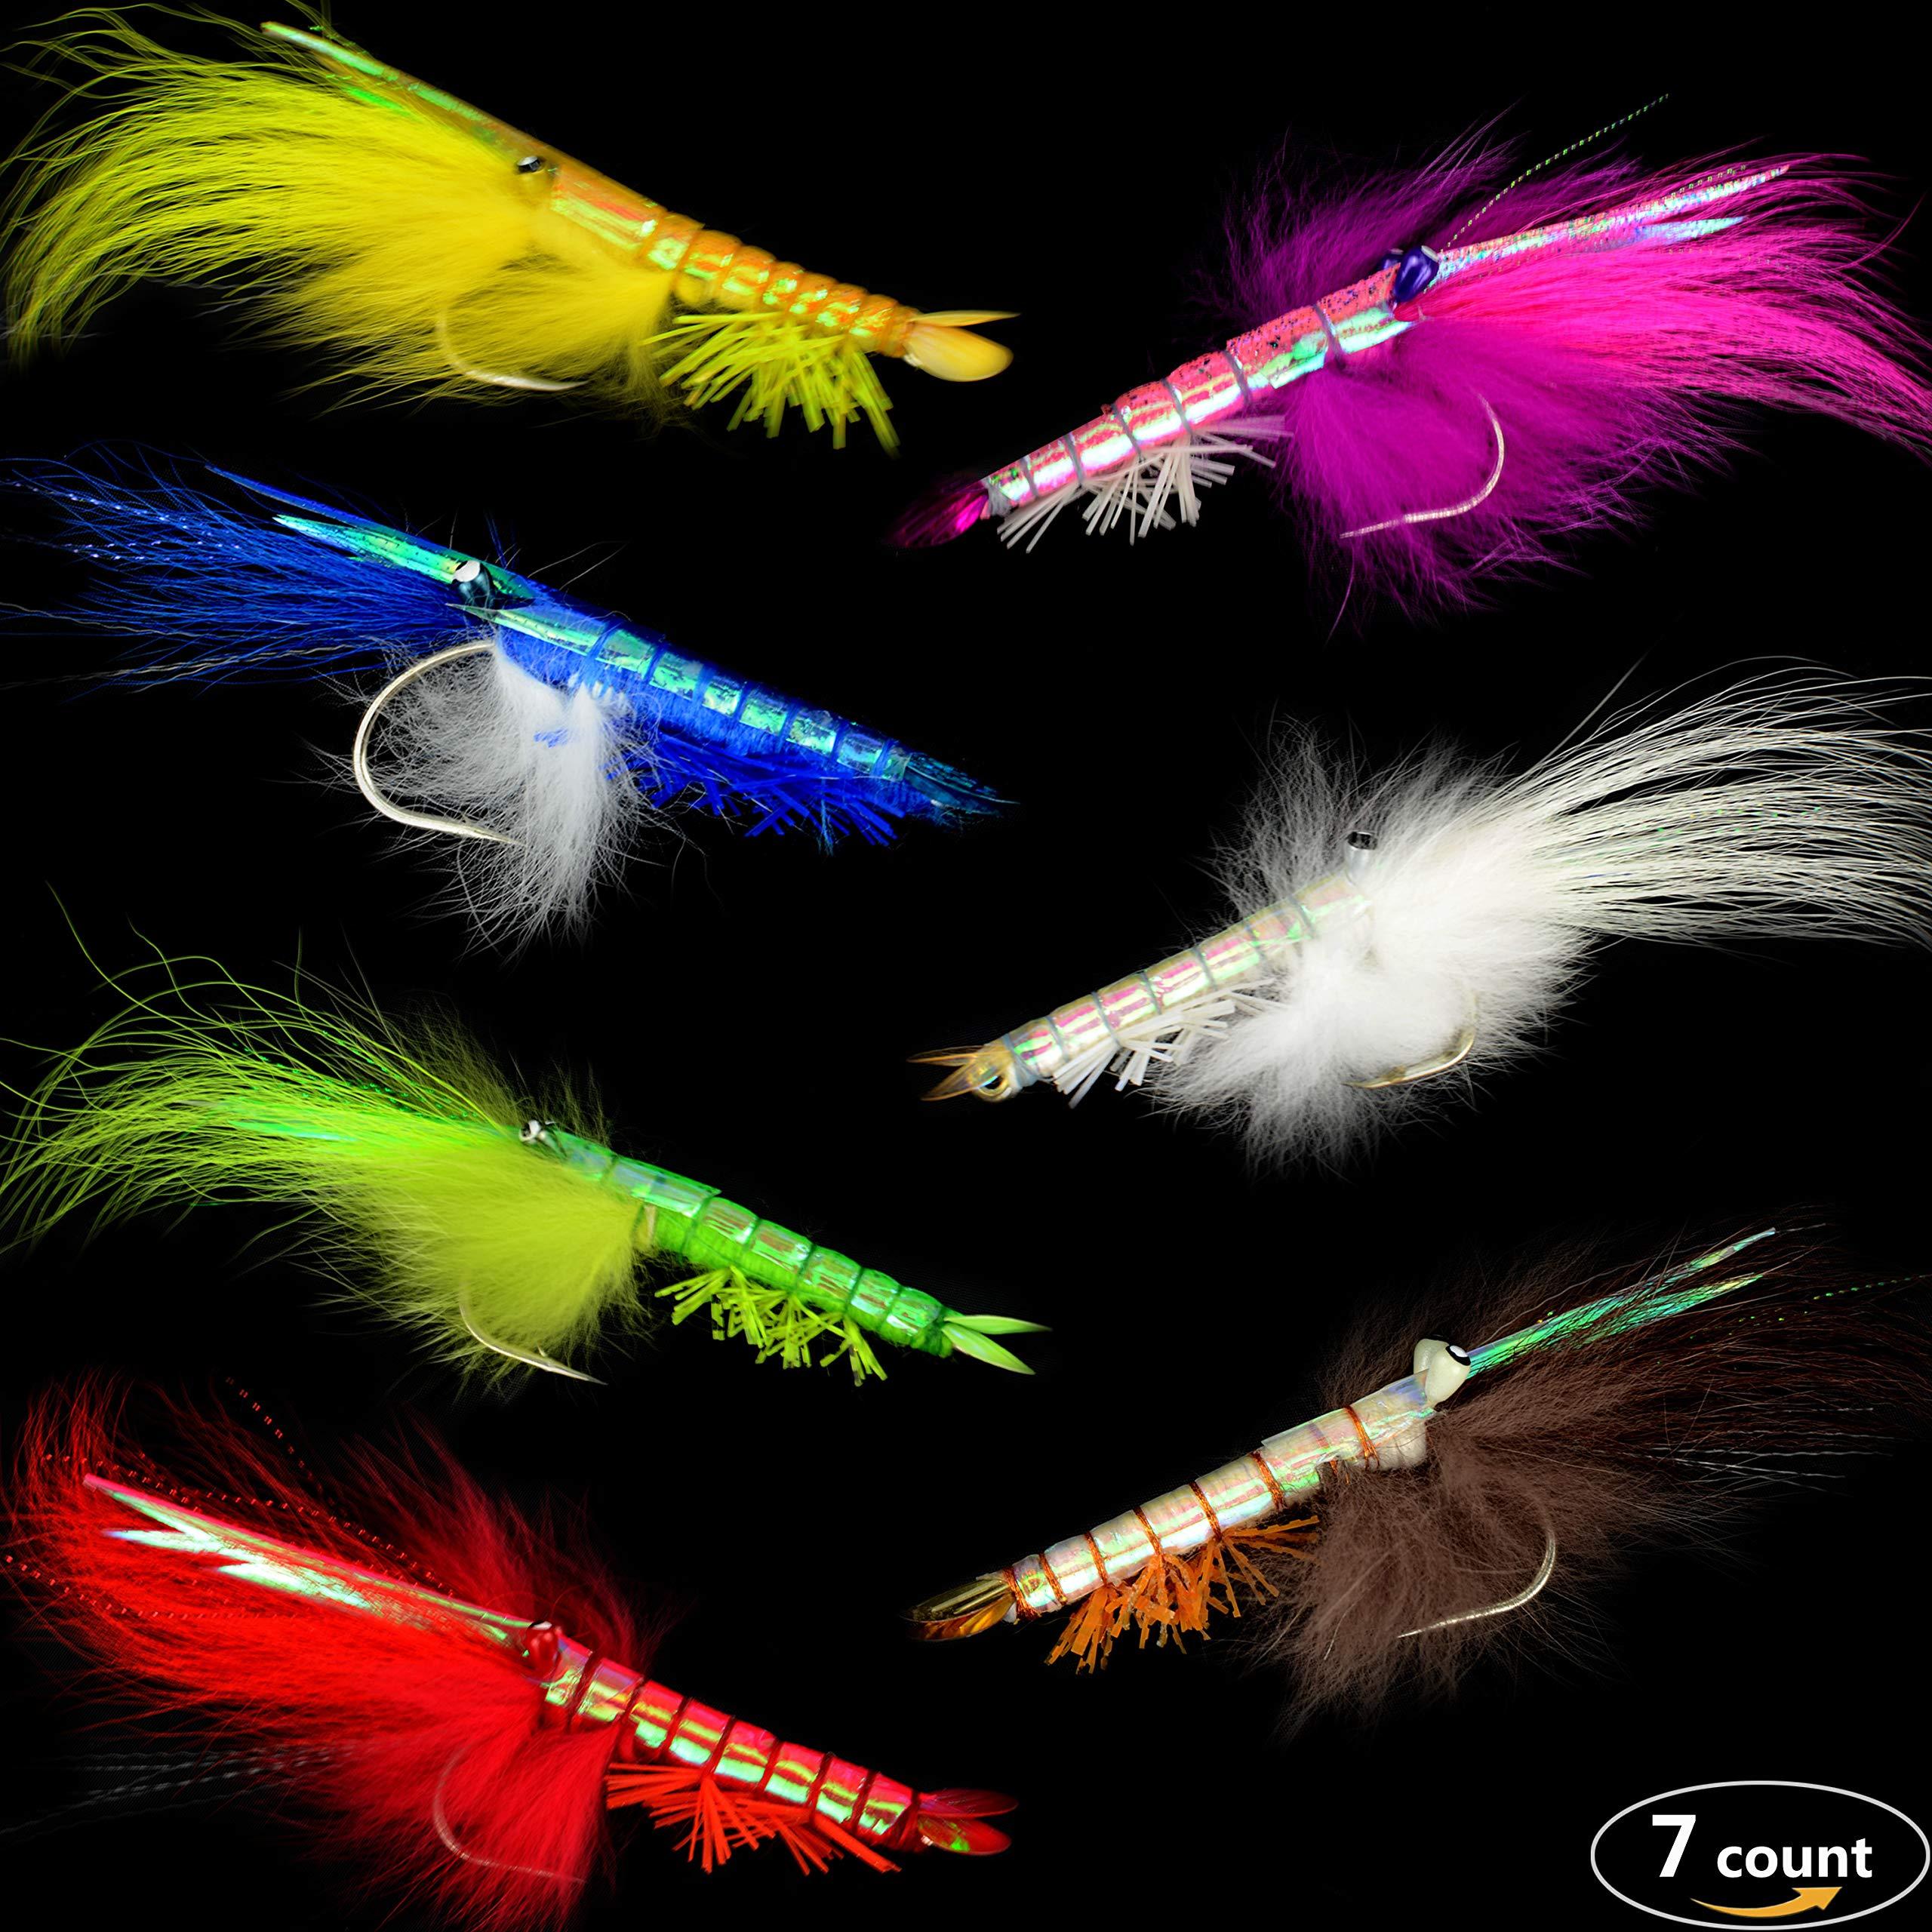 YAZHIDA Realistic Seven Color Shrimp Flies- Saltwater Fly Fishing Flies for Bonefish and Redfish